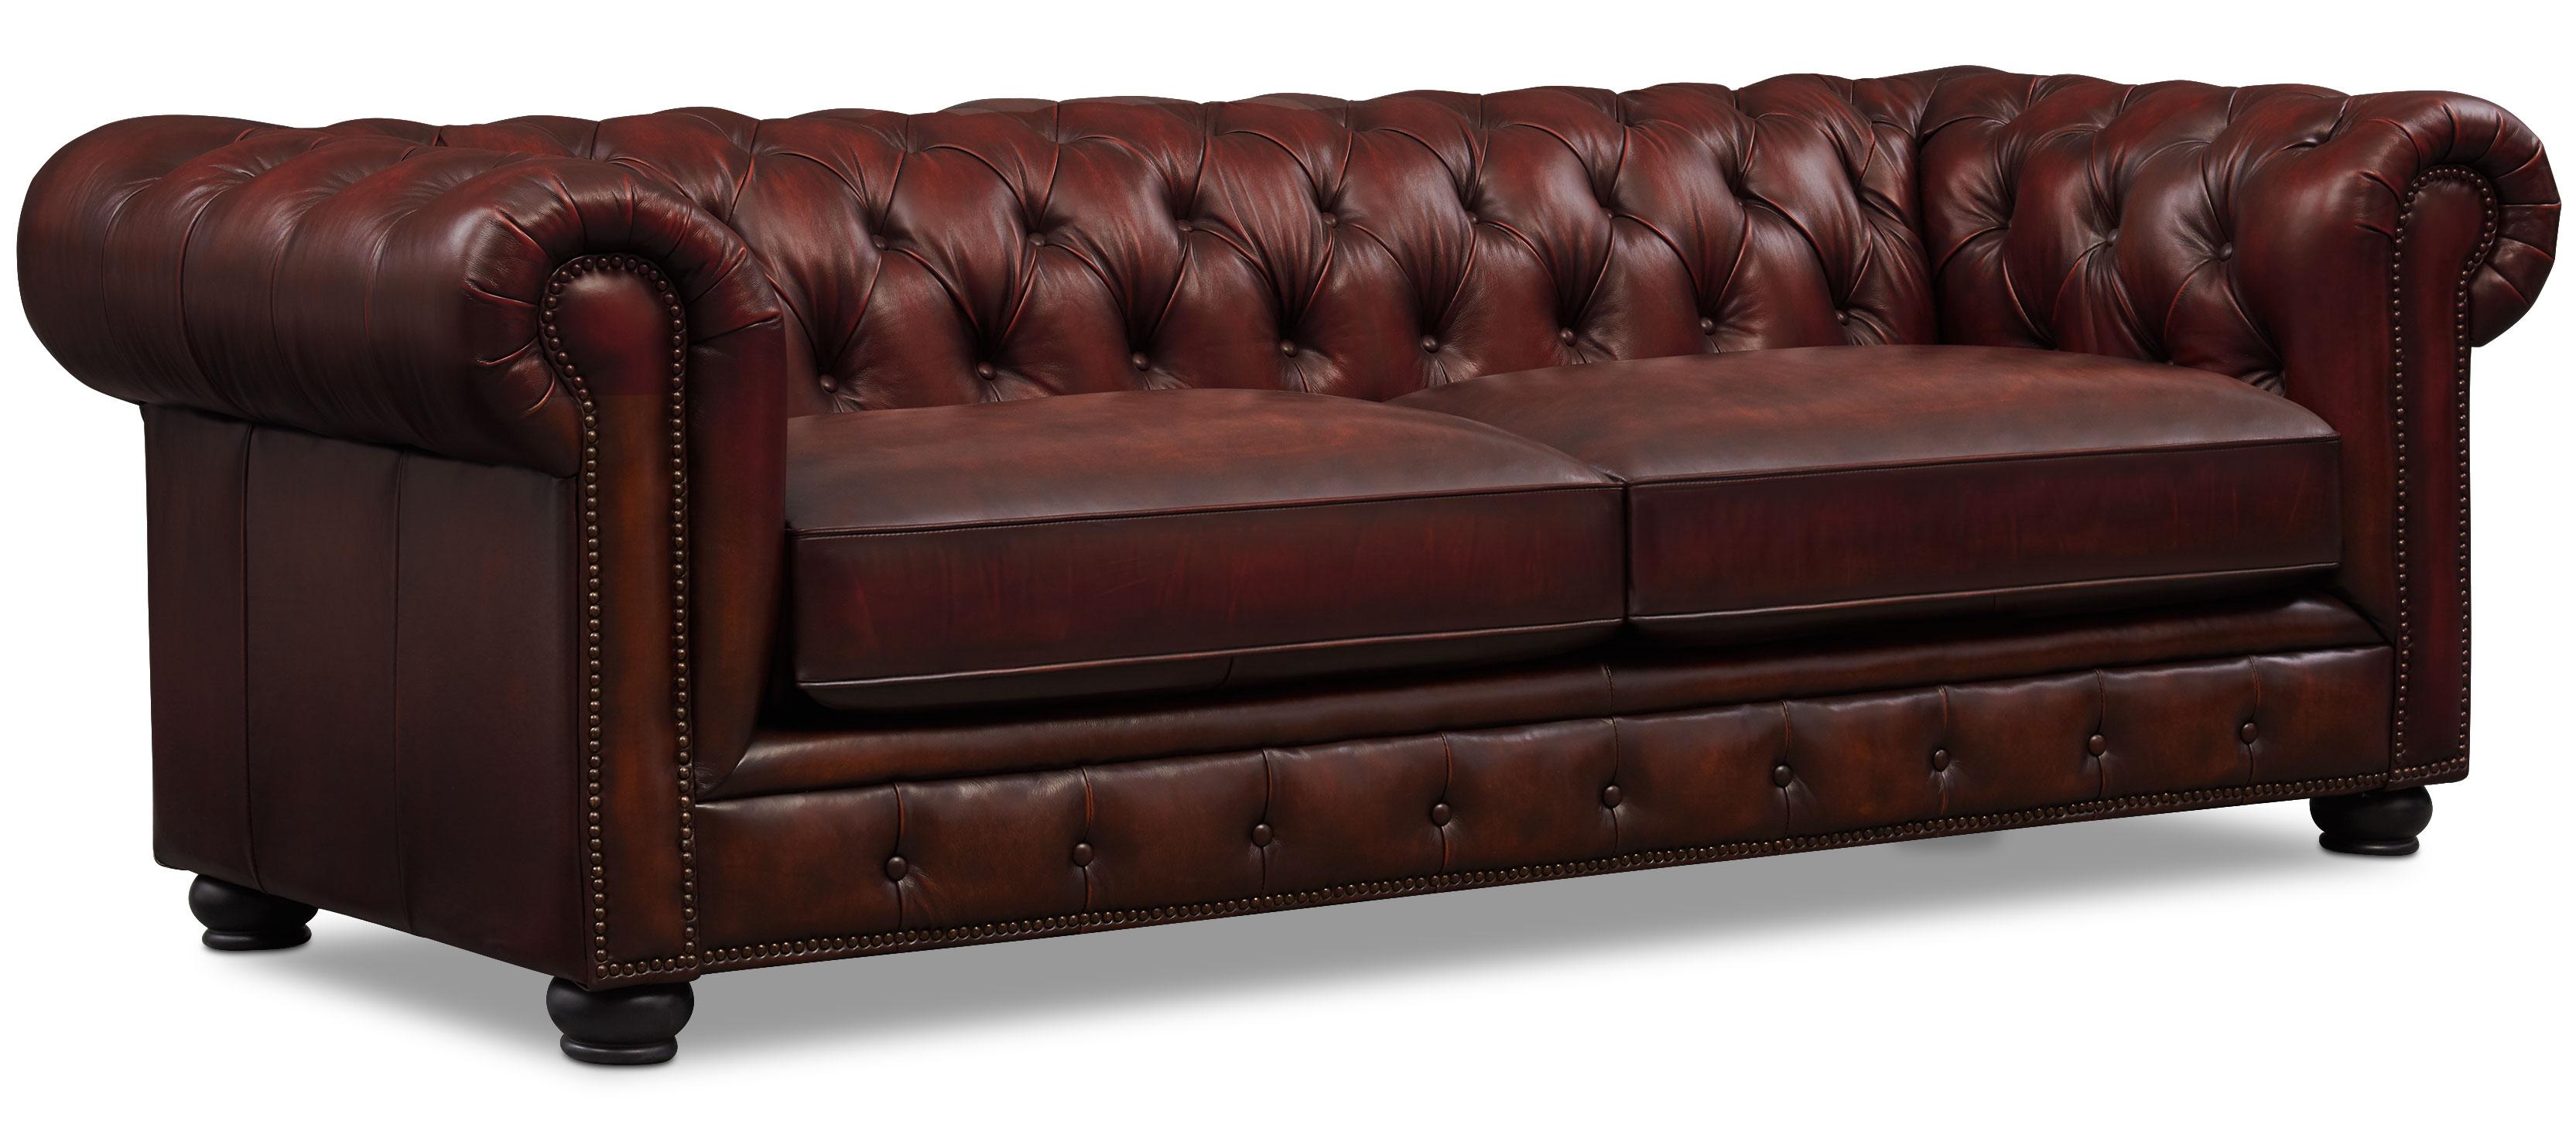 Living Room Furniture - Lexington Sofa